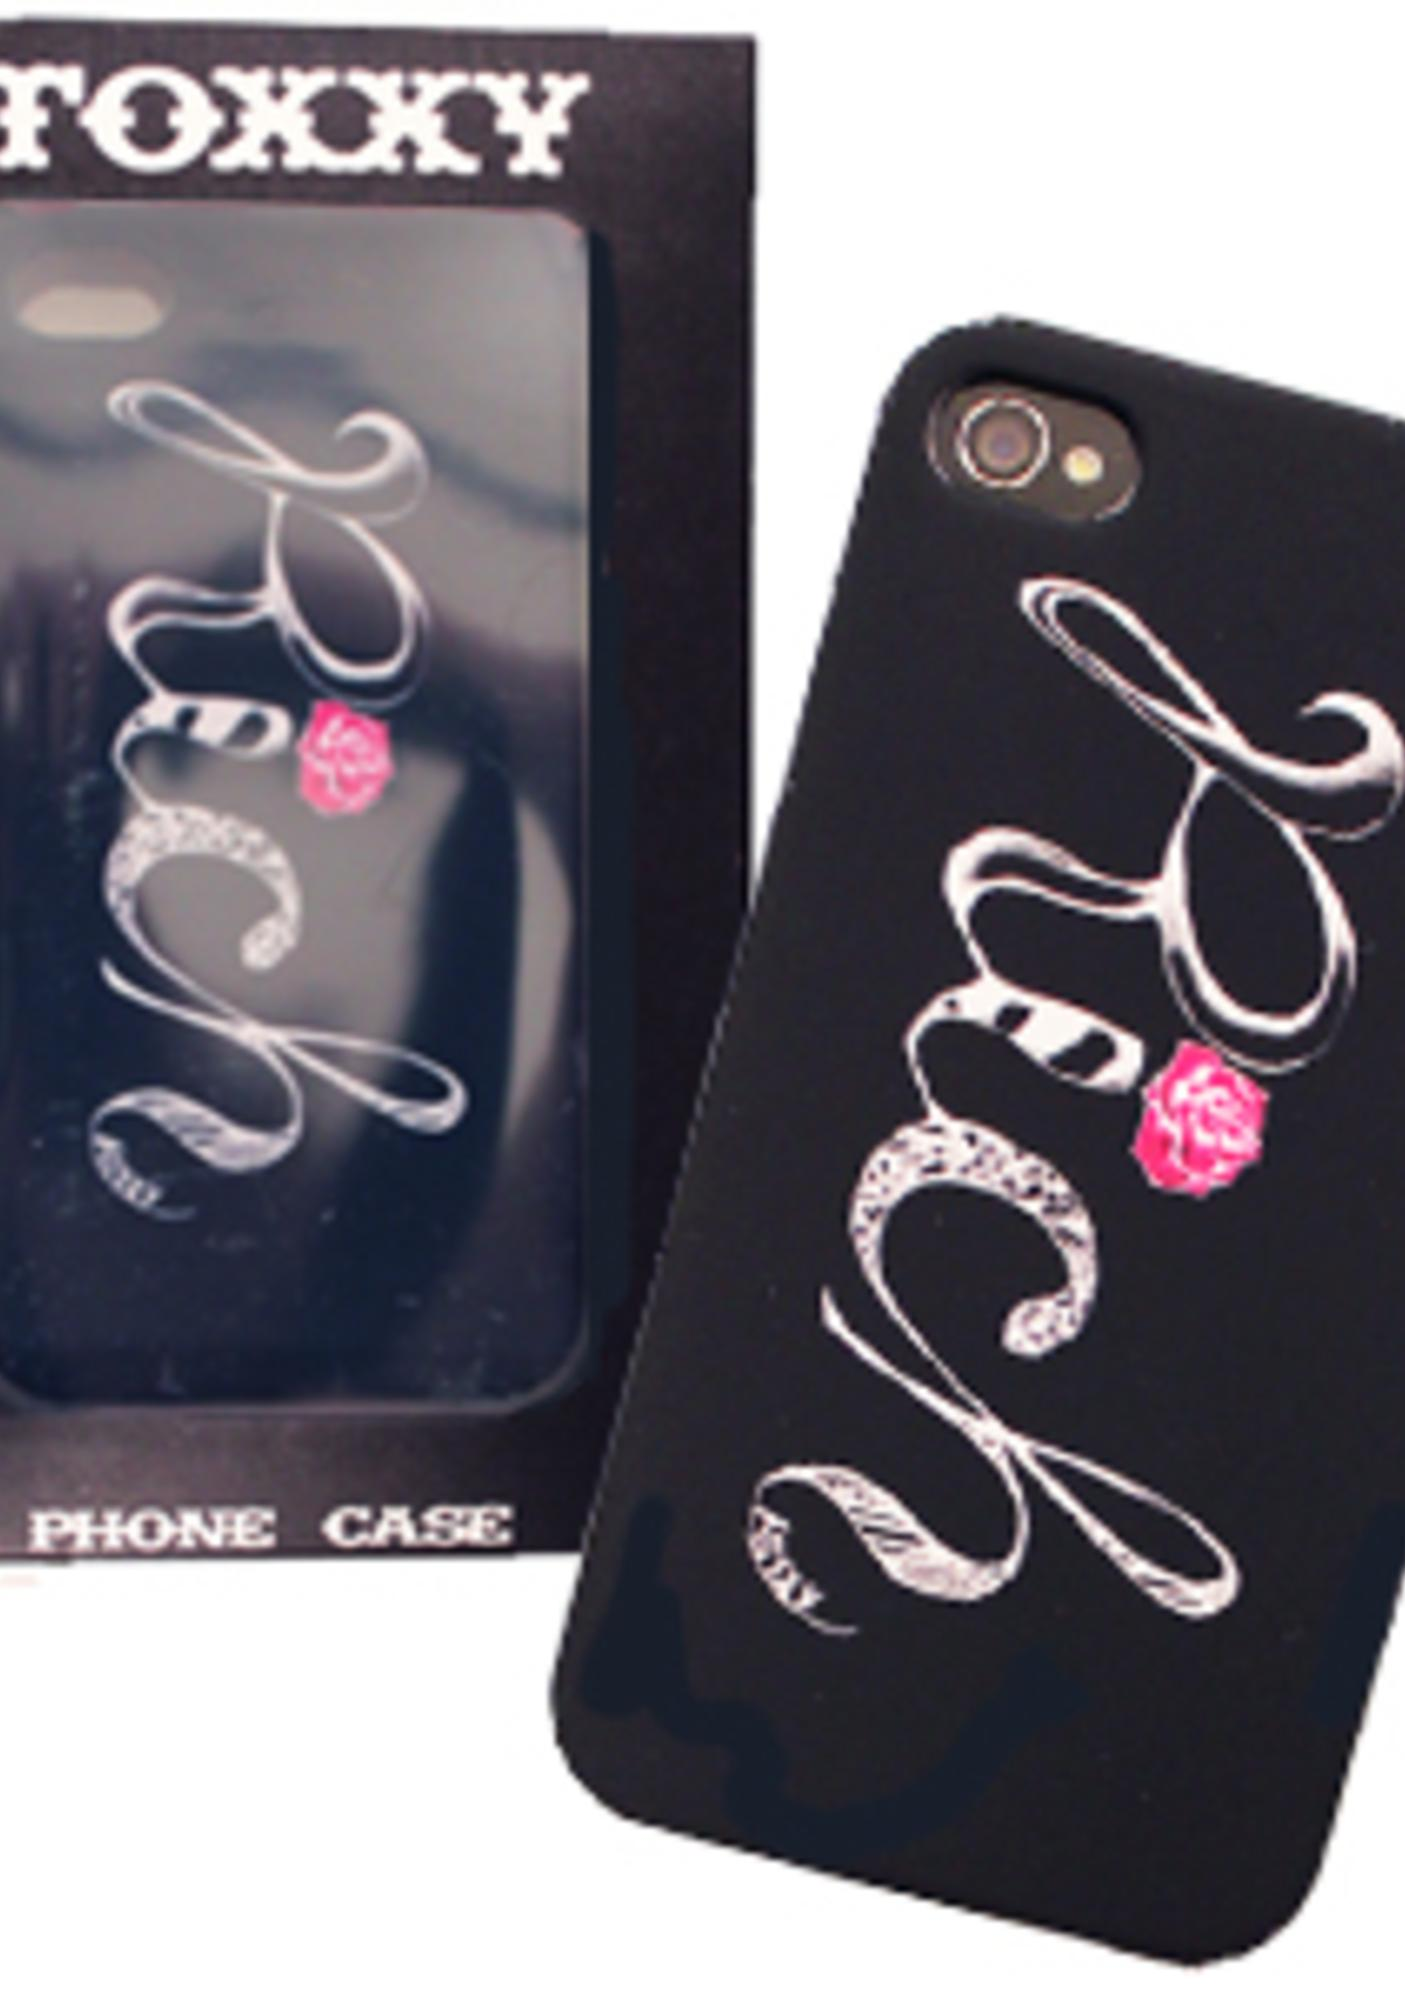 Rich iPhone Case